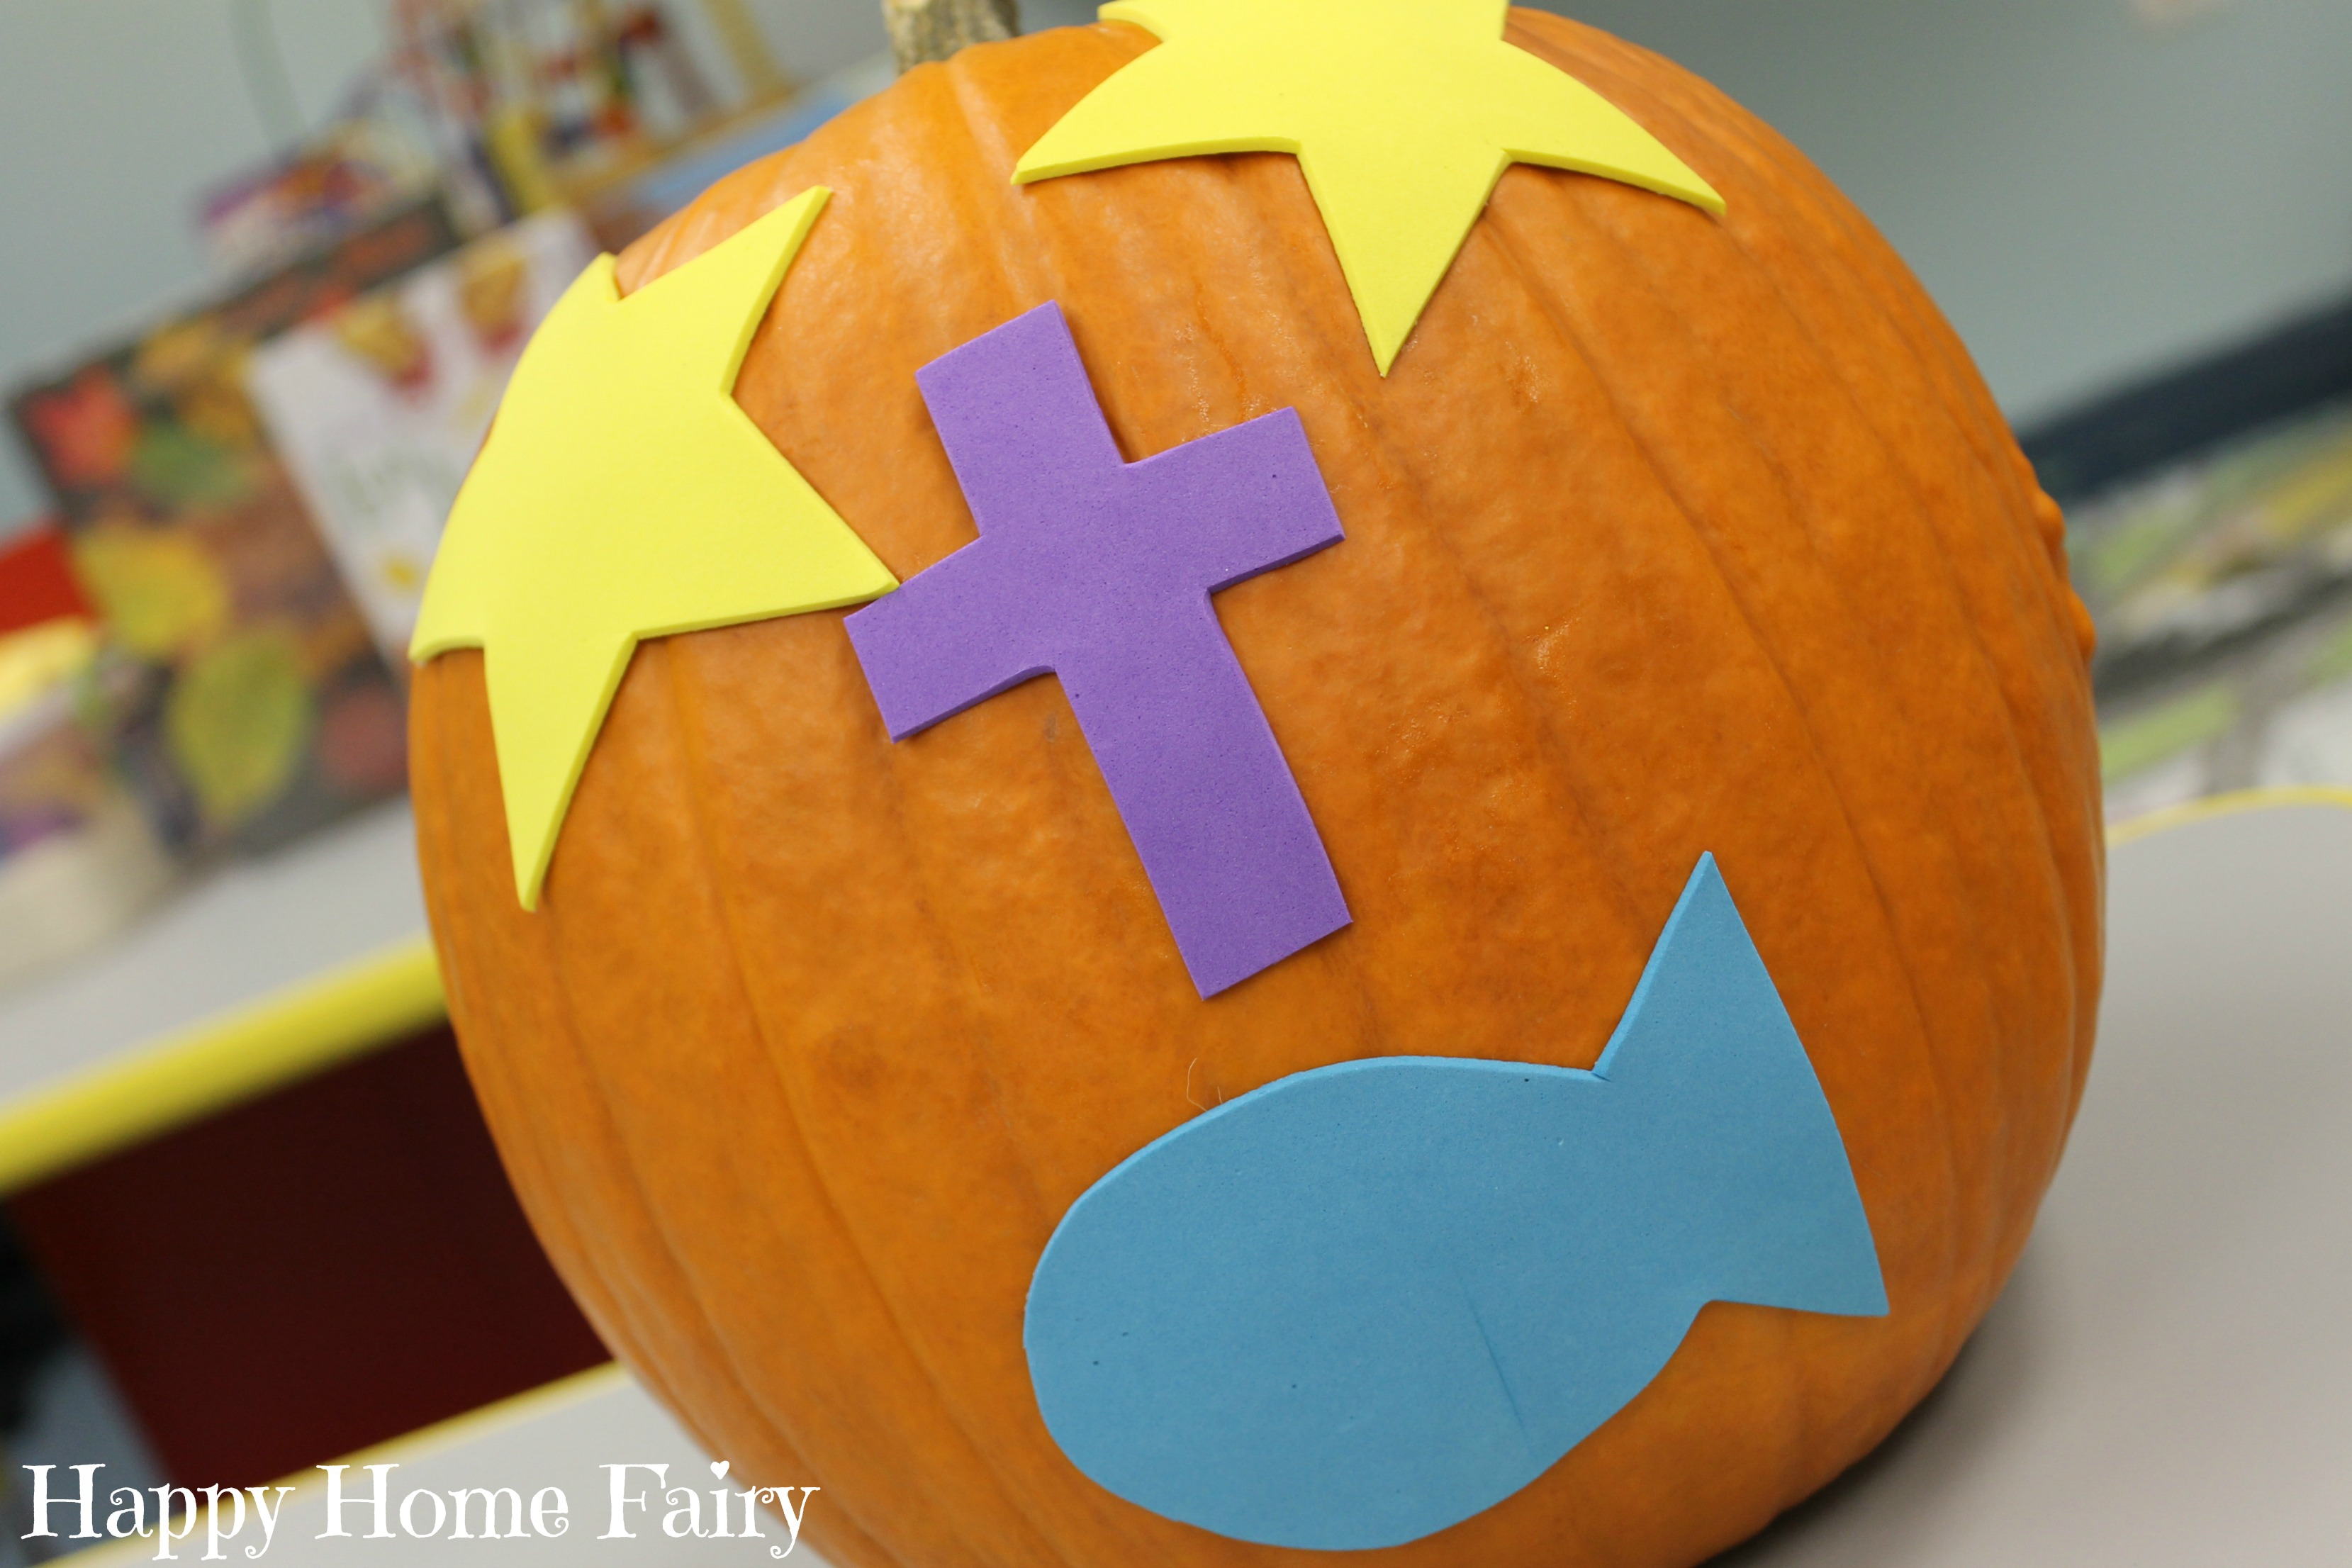 The Gospel Pumpkin